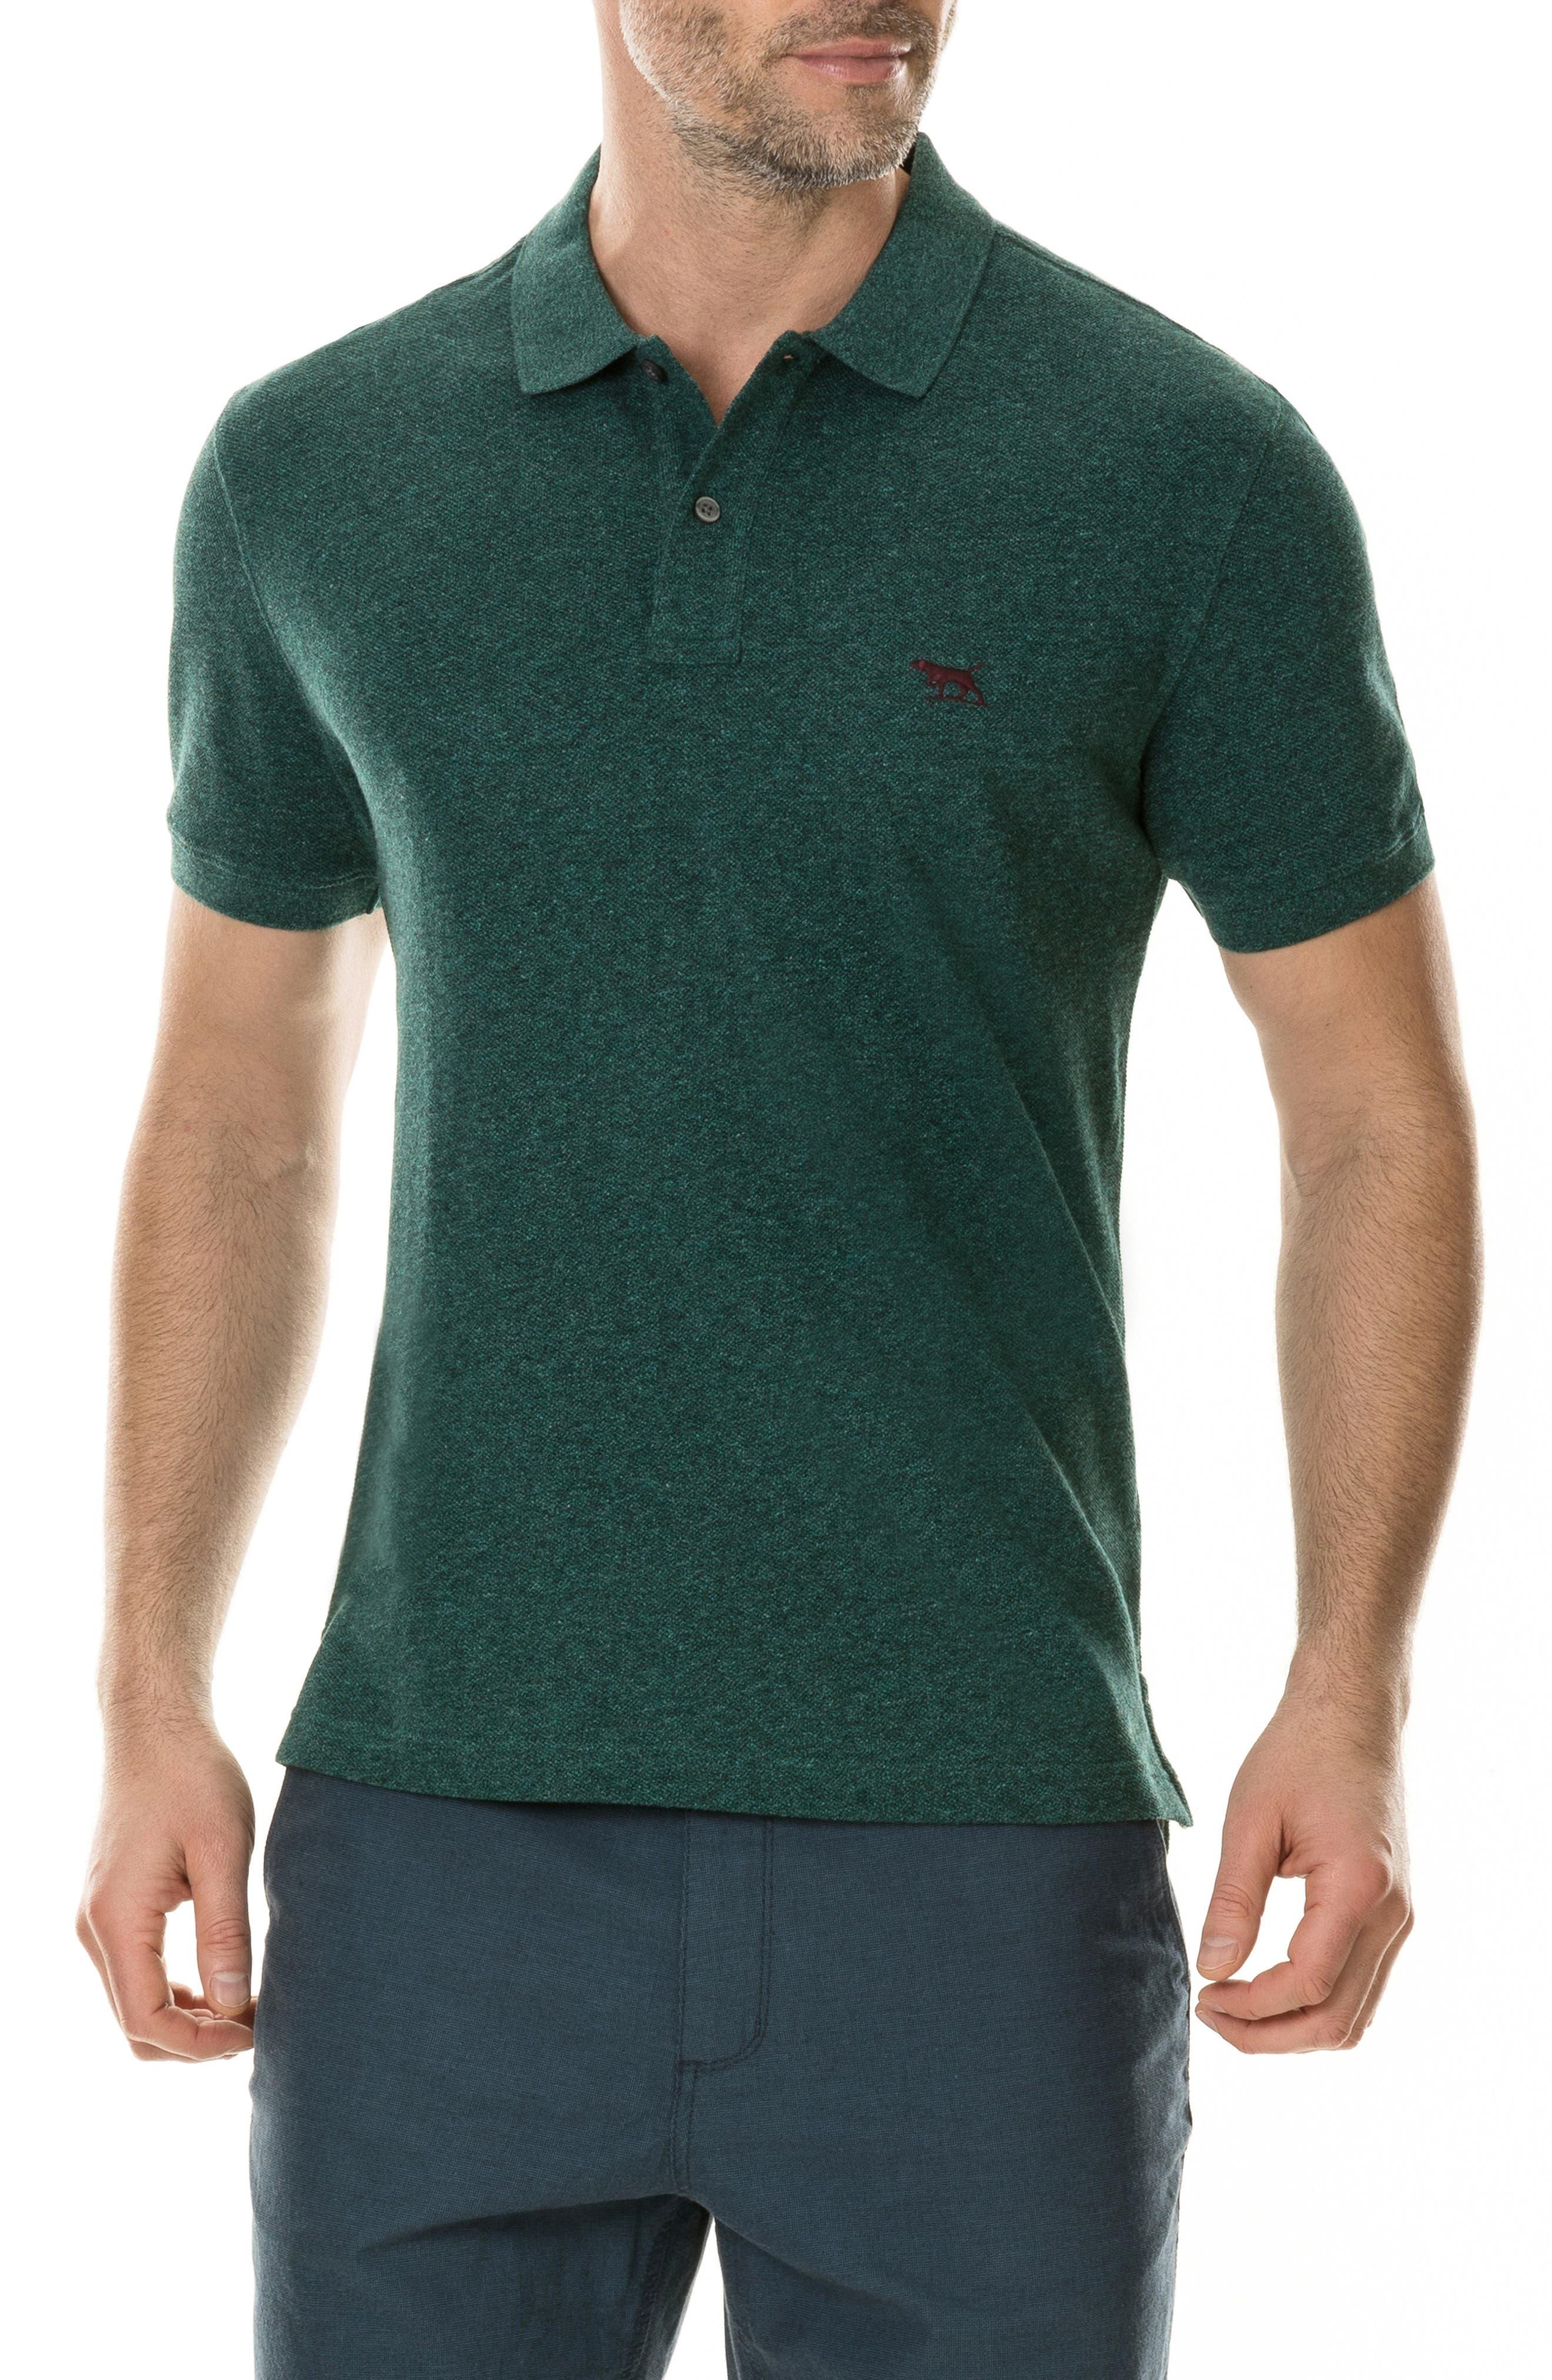 'The Gunn' Piqué Sports Fit Cotton Polo,                         Main,                         color, PINE